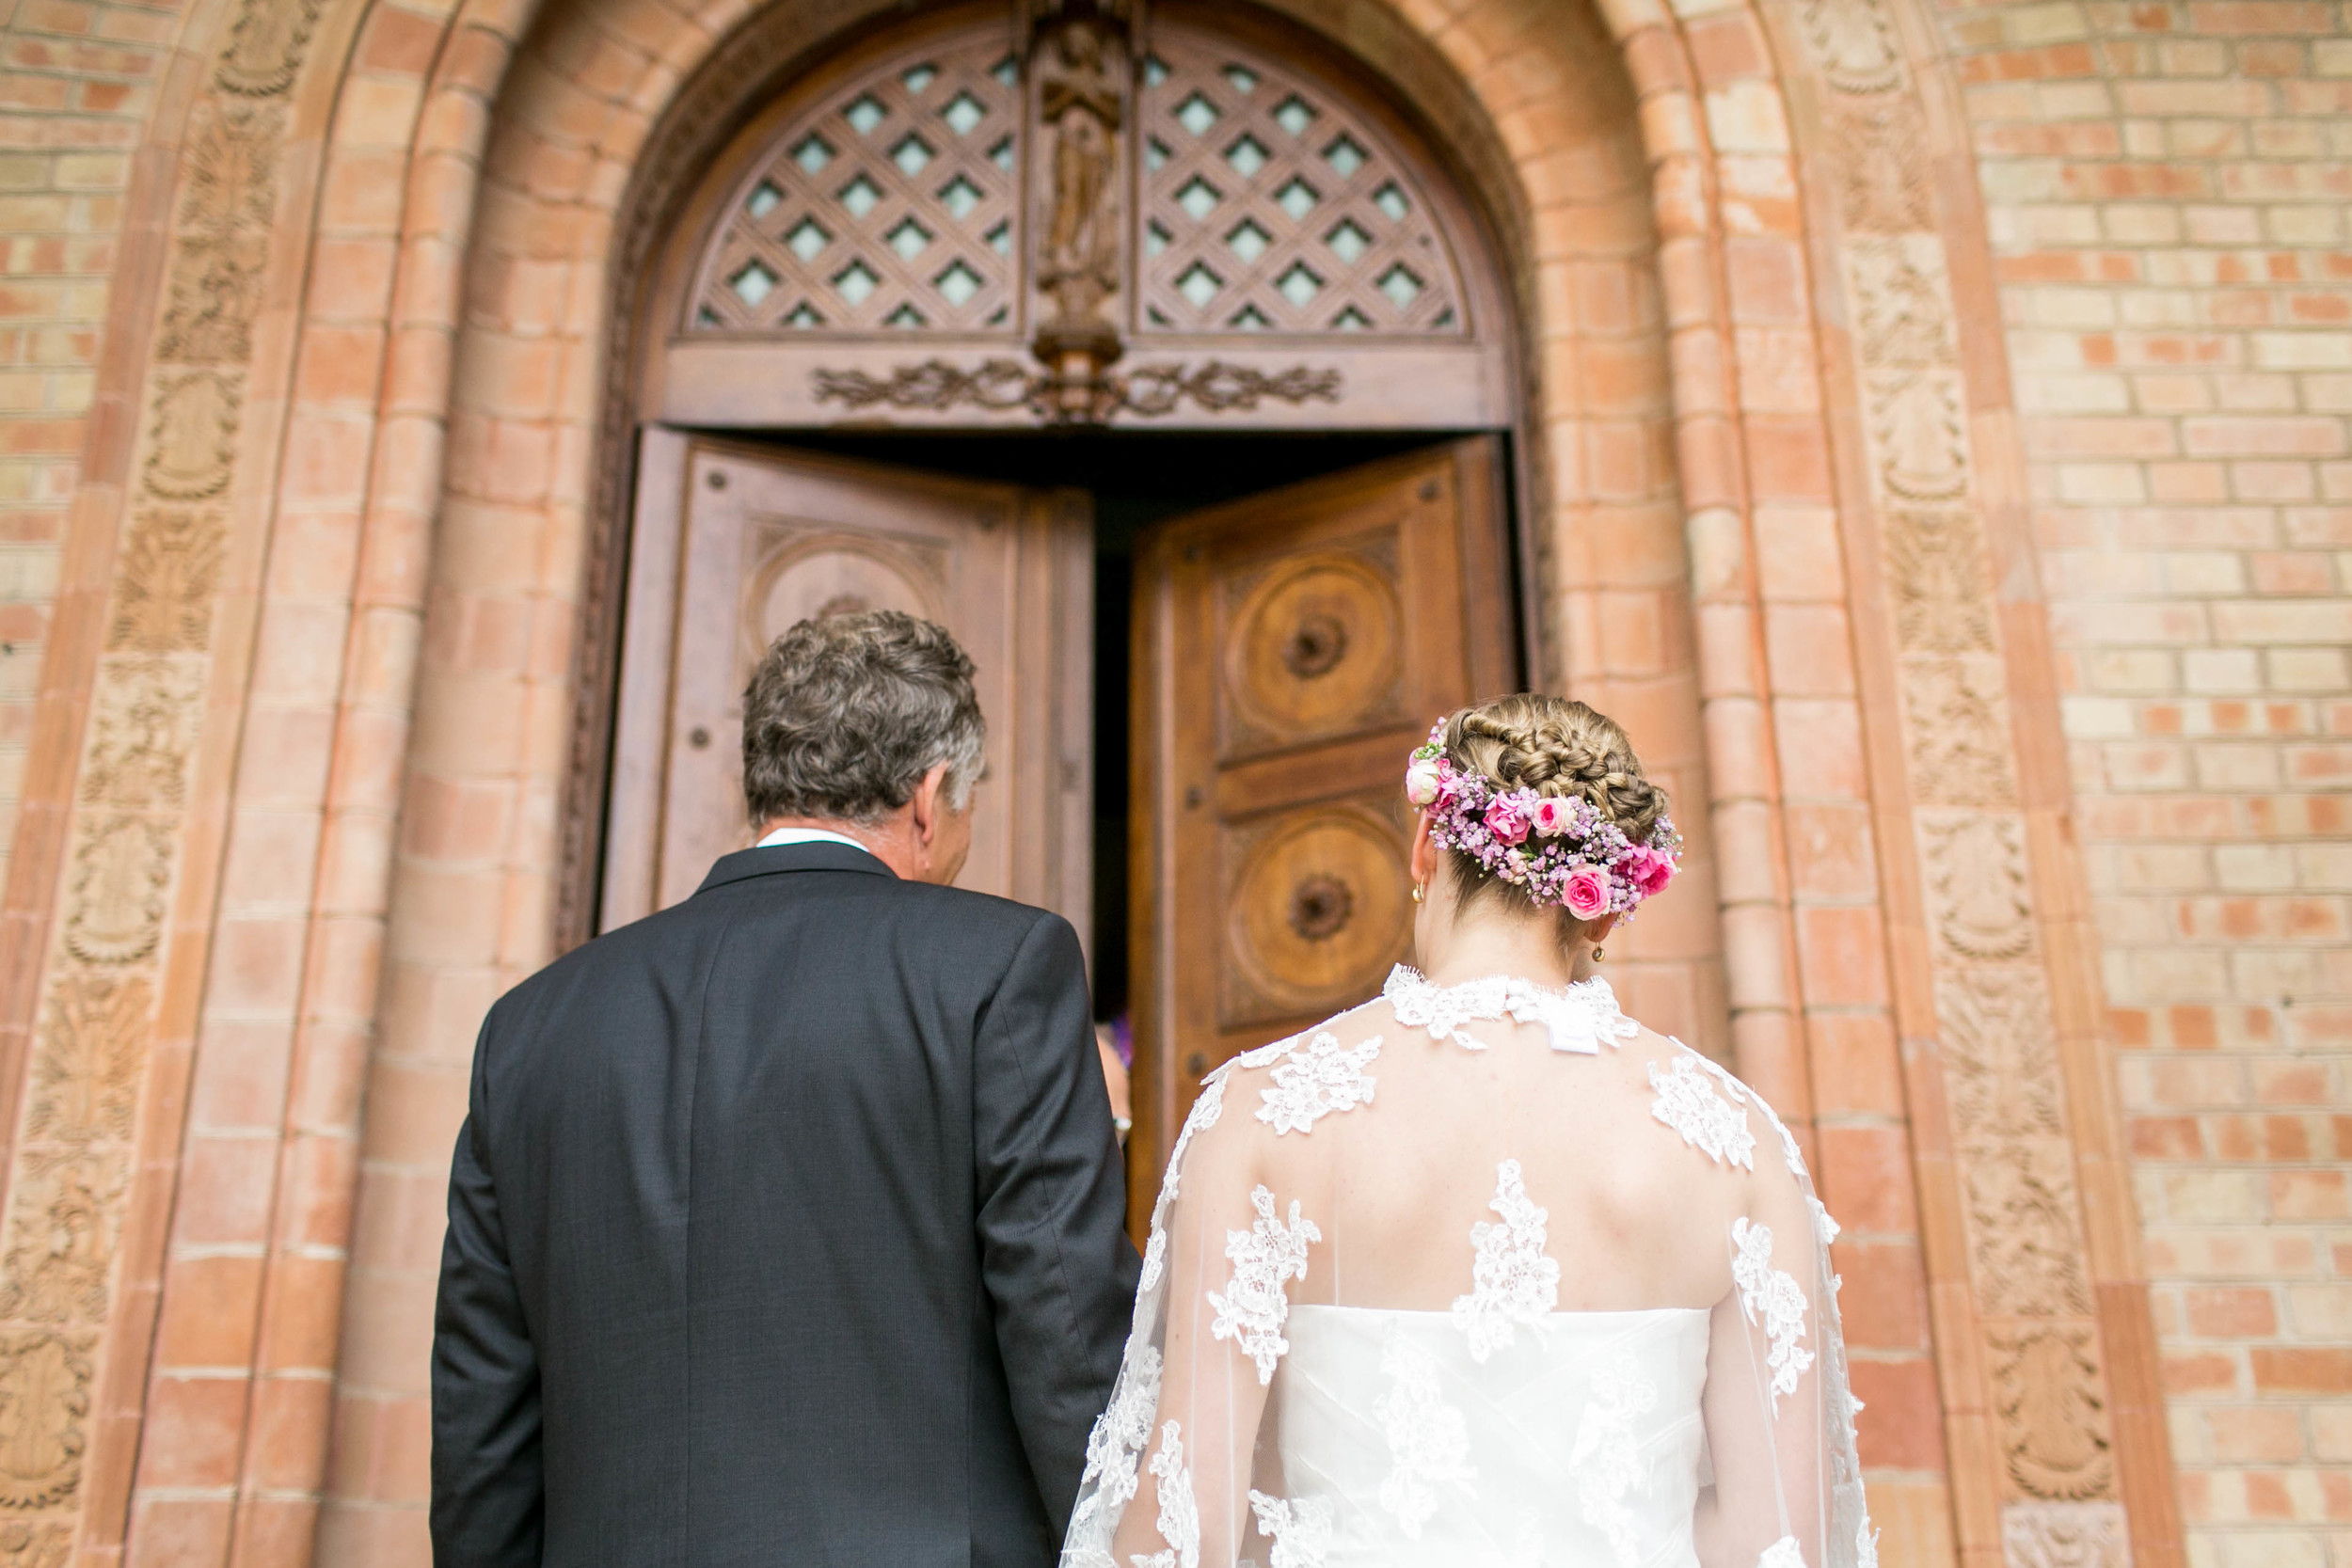 Fran Burrows Berlin Hochzeitsfotografie-19.jpg